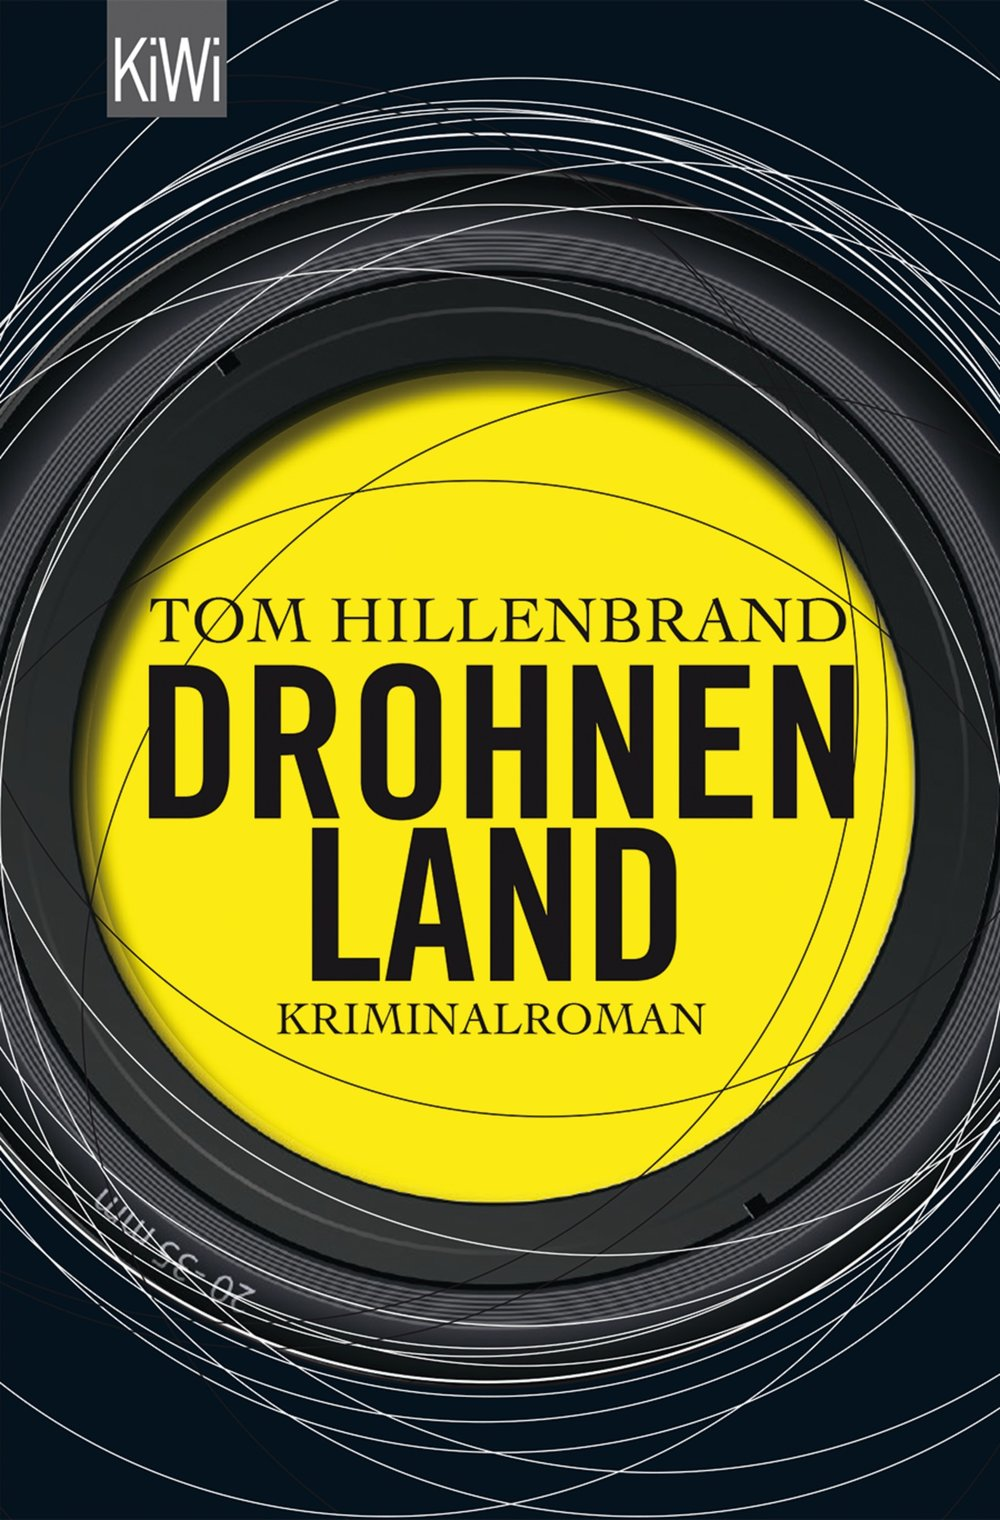 hillenbrand_tom_drohnenland_phantastik-autoren-netzwerk.jpg